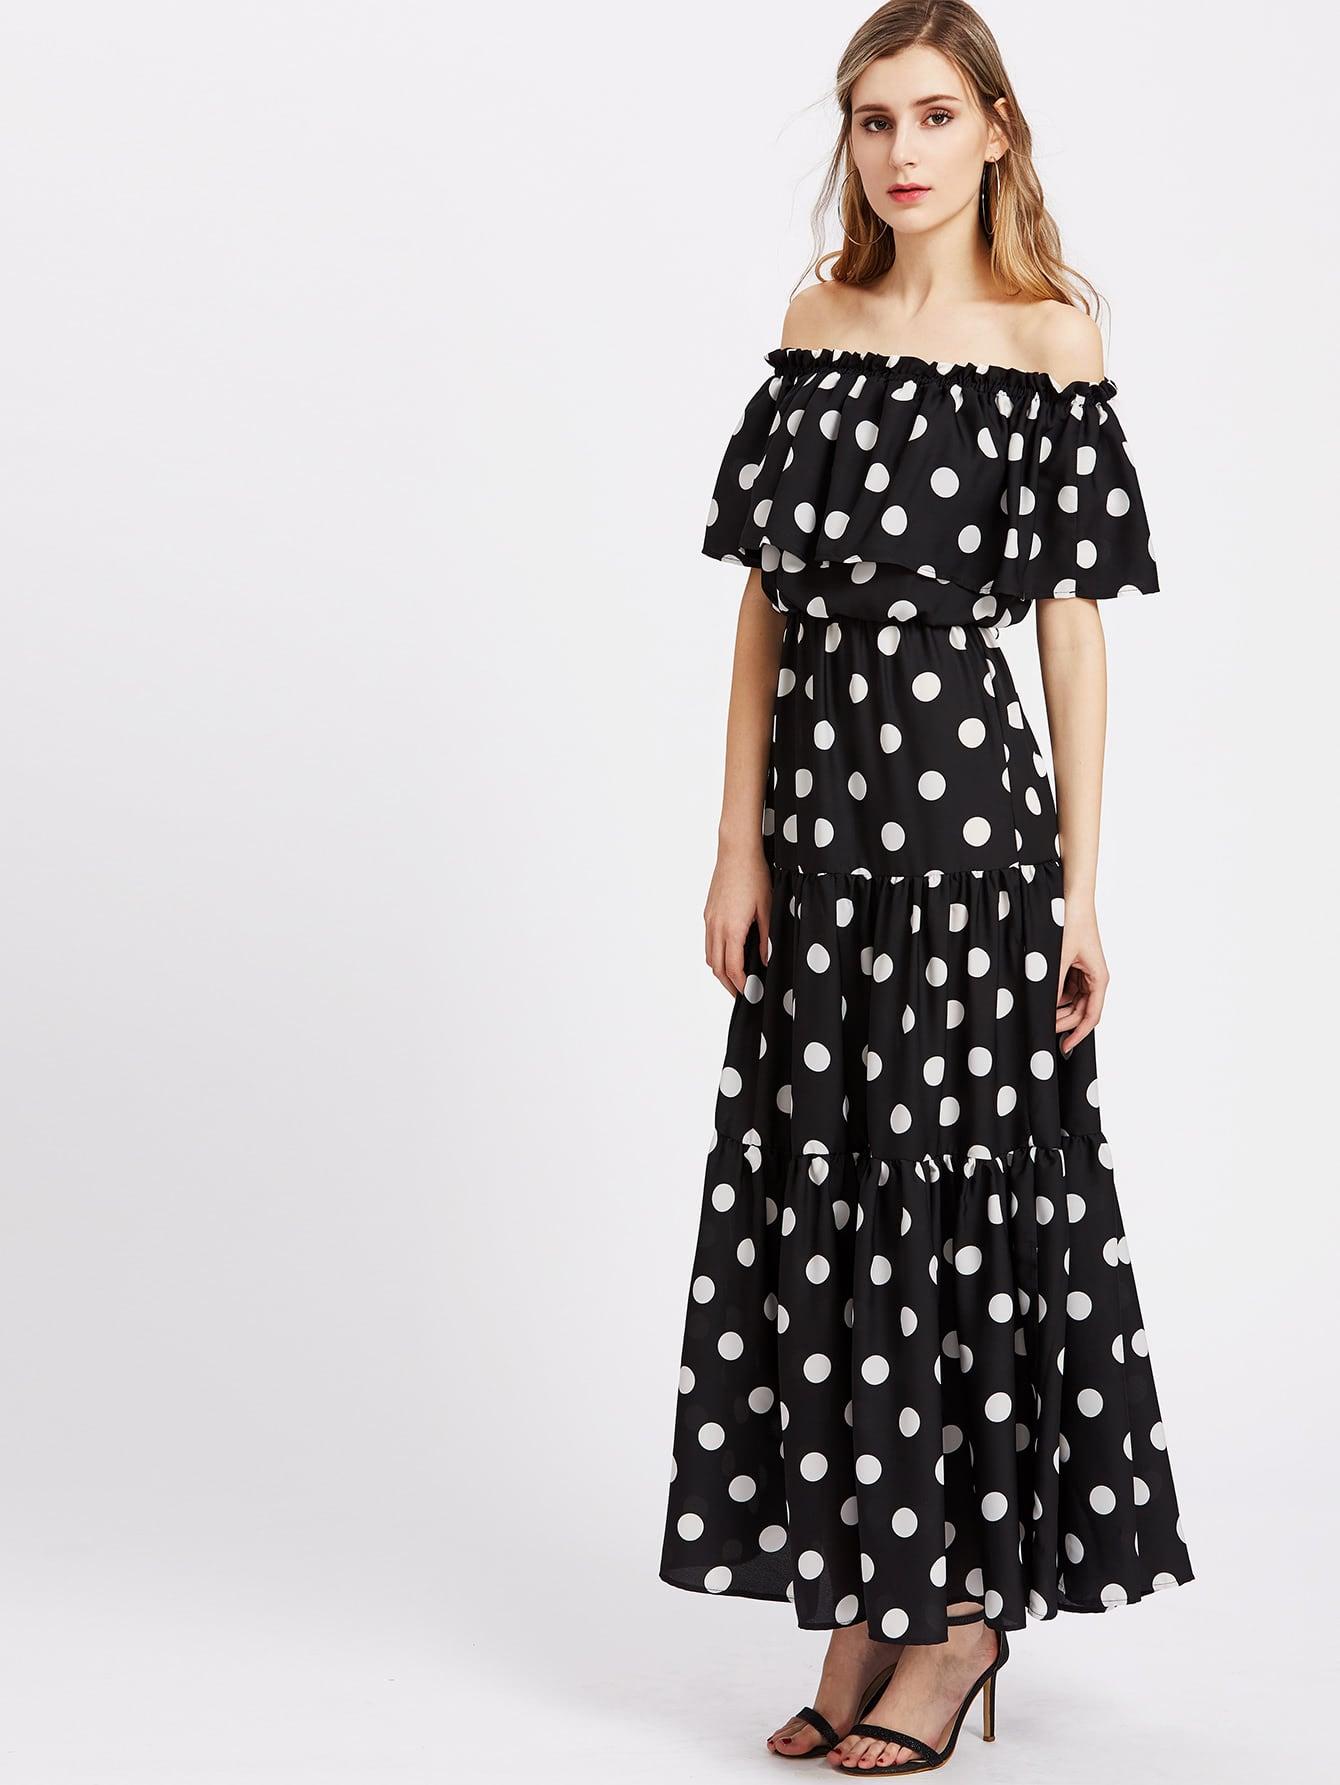 Фото Polka Dot Print Tiered Flounce Bardot Dress. Купить с доставкой